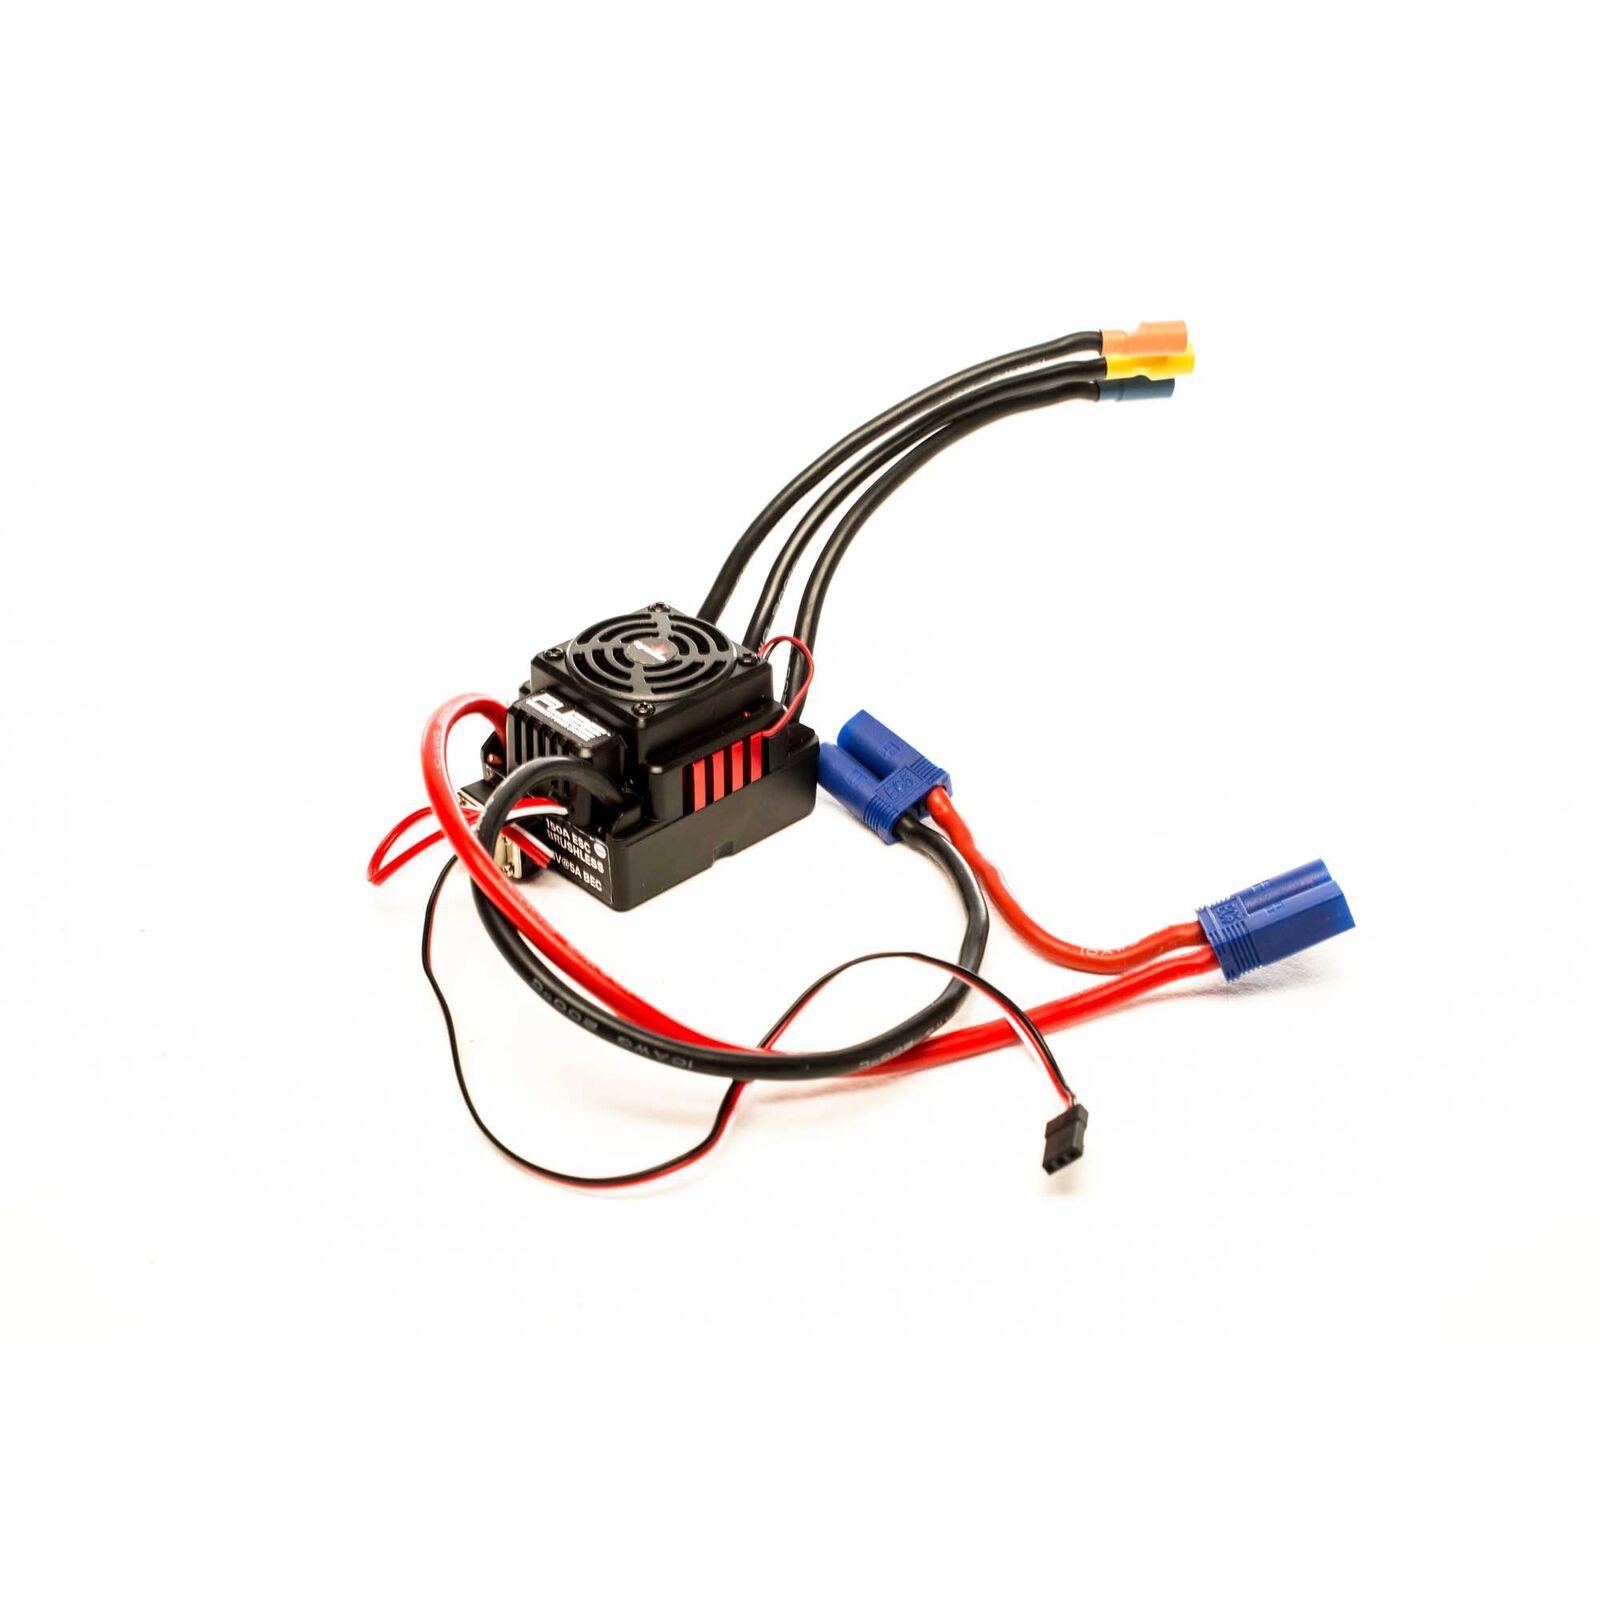 Fuze 150A Sensorless BL WP ESC  3-6S